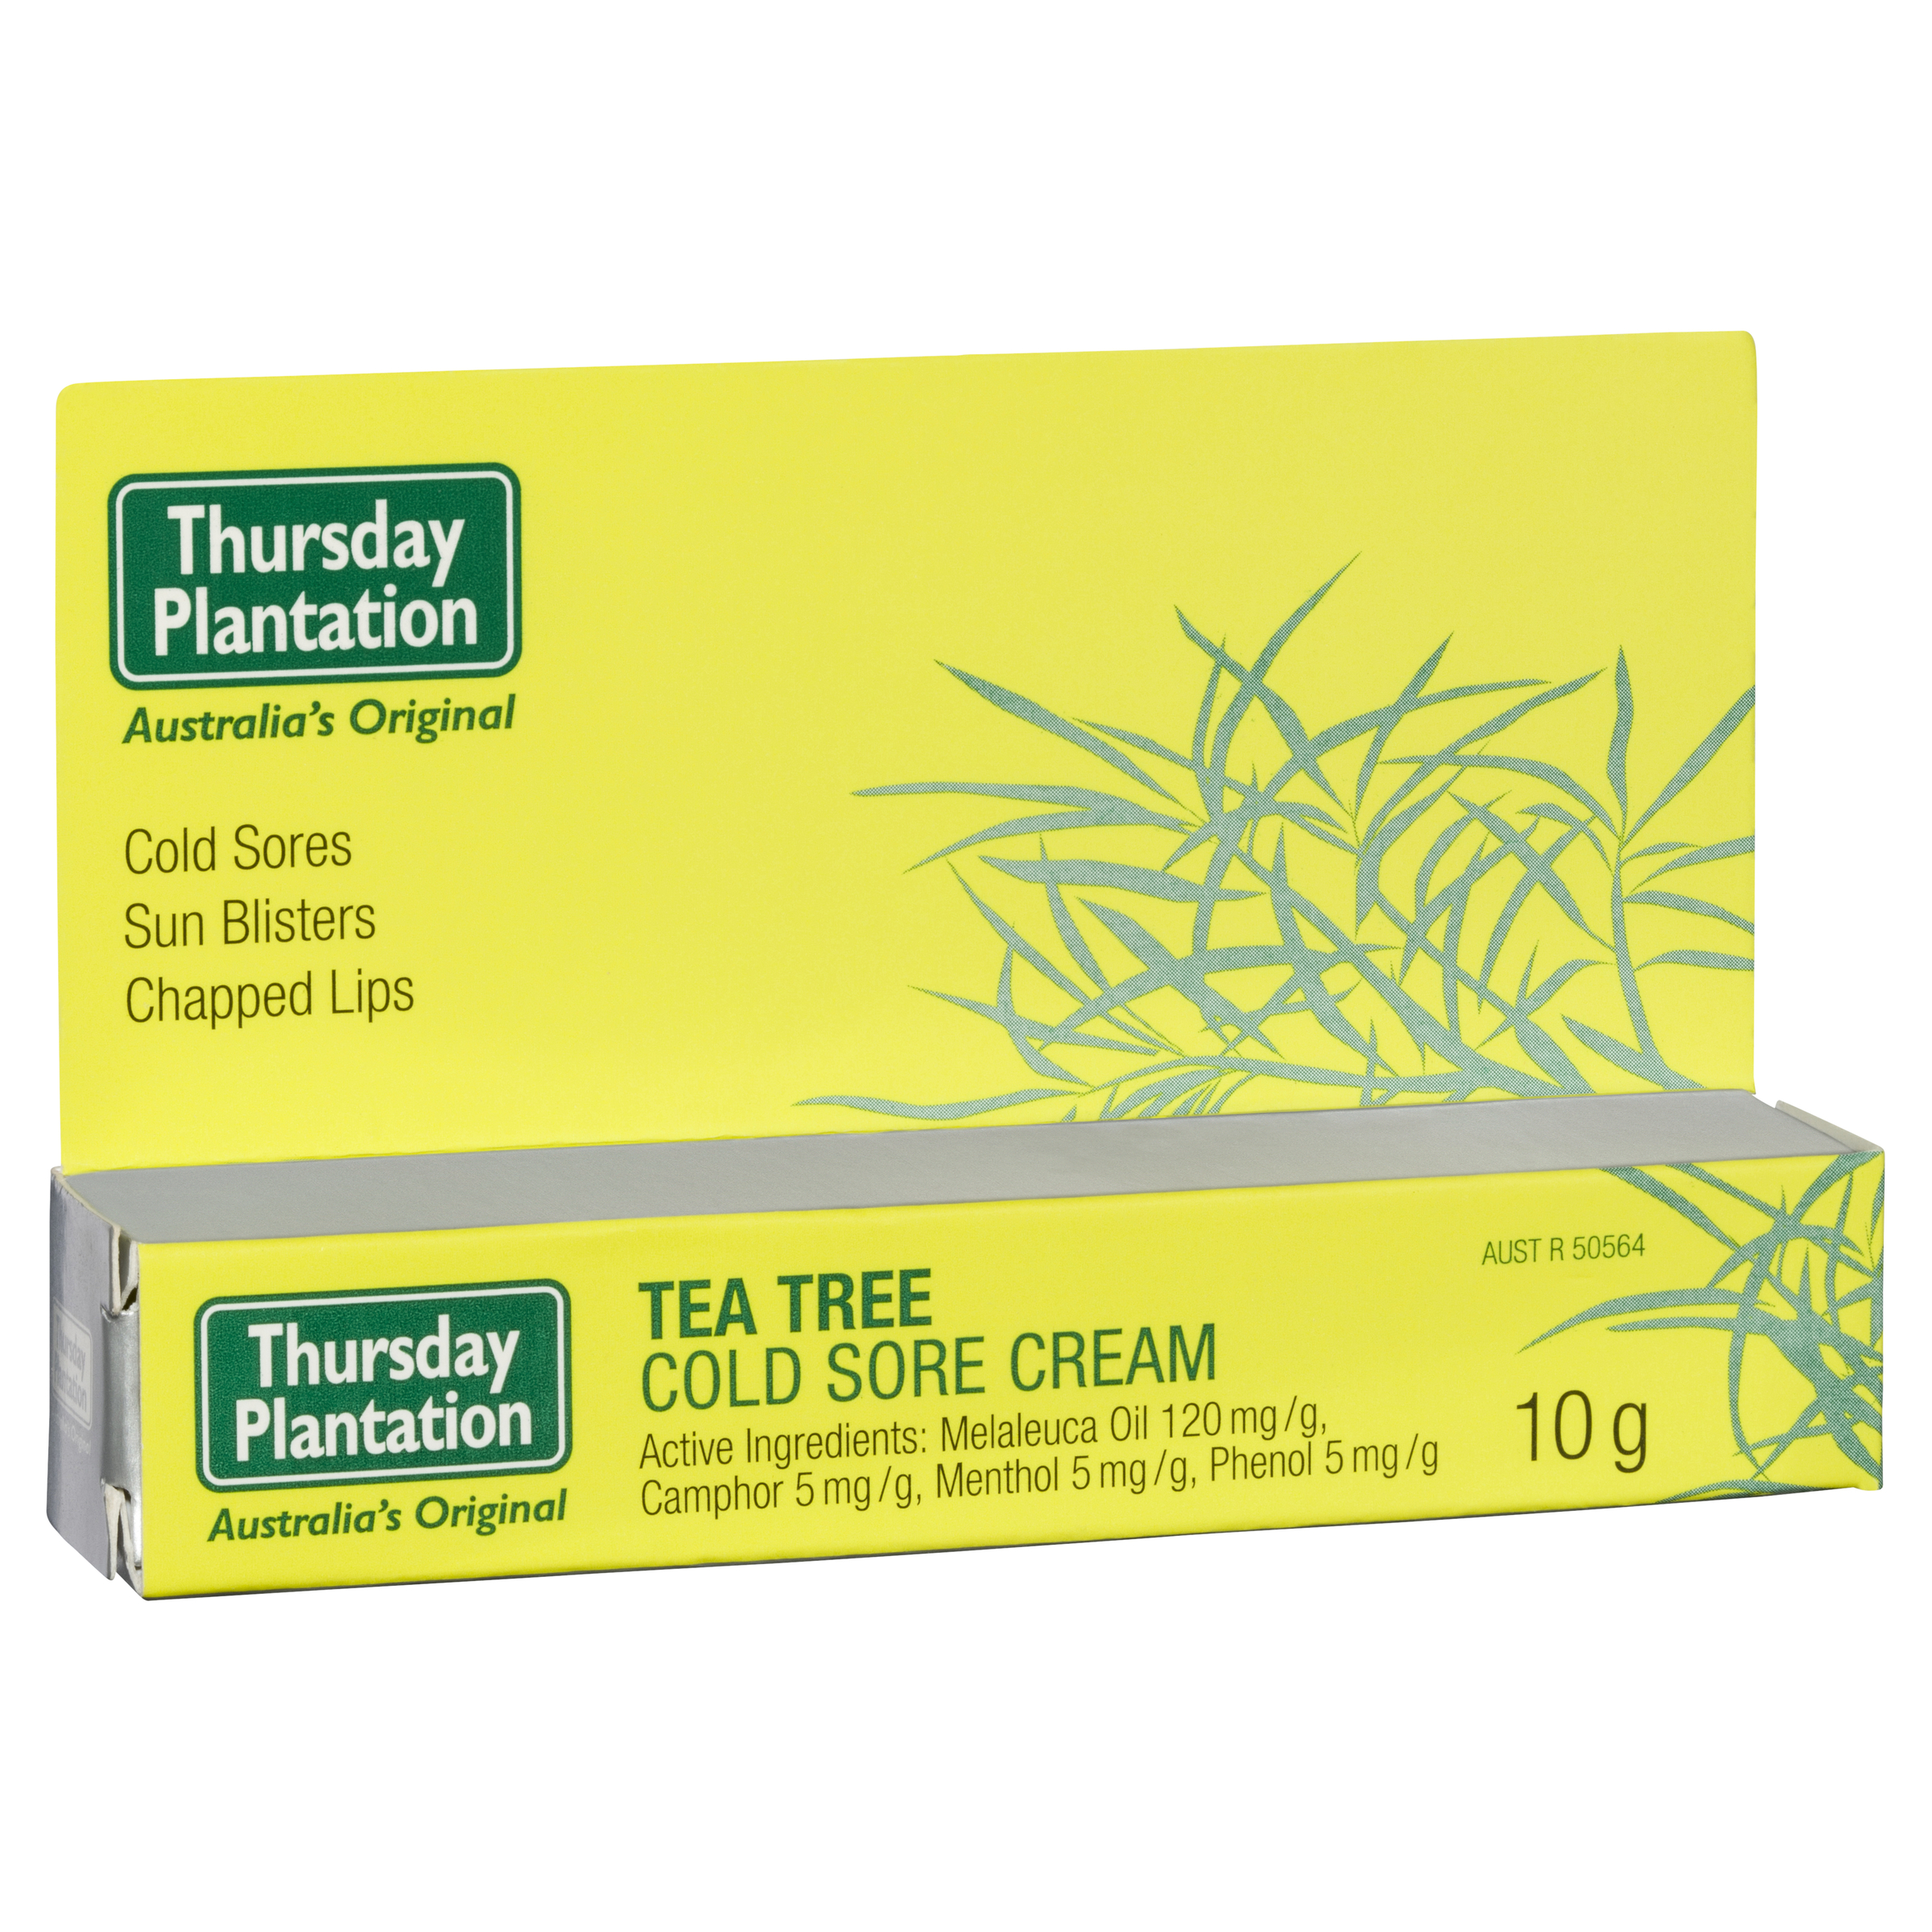 Image of Tea Tree Cold Sore Cream 10gm